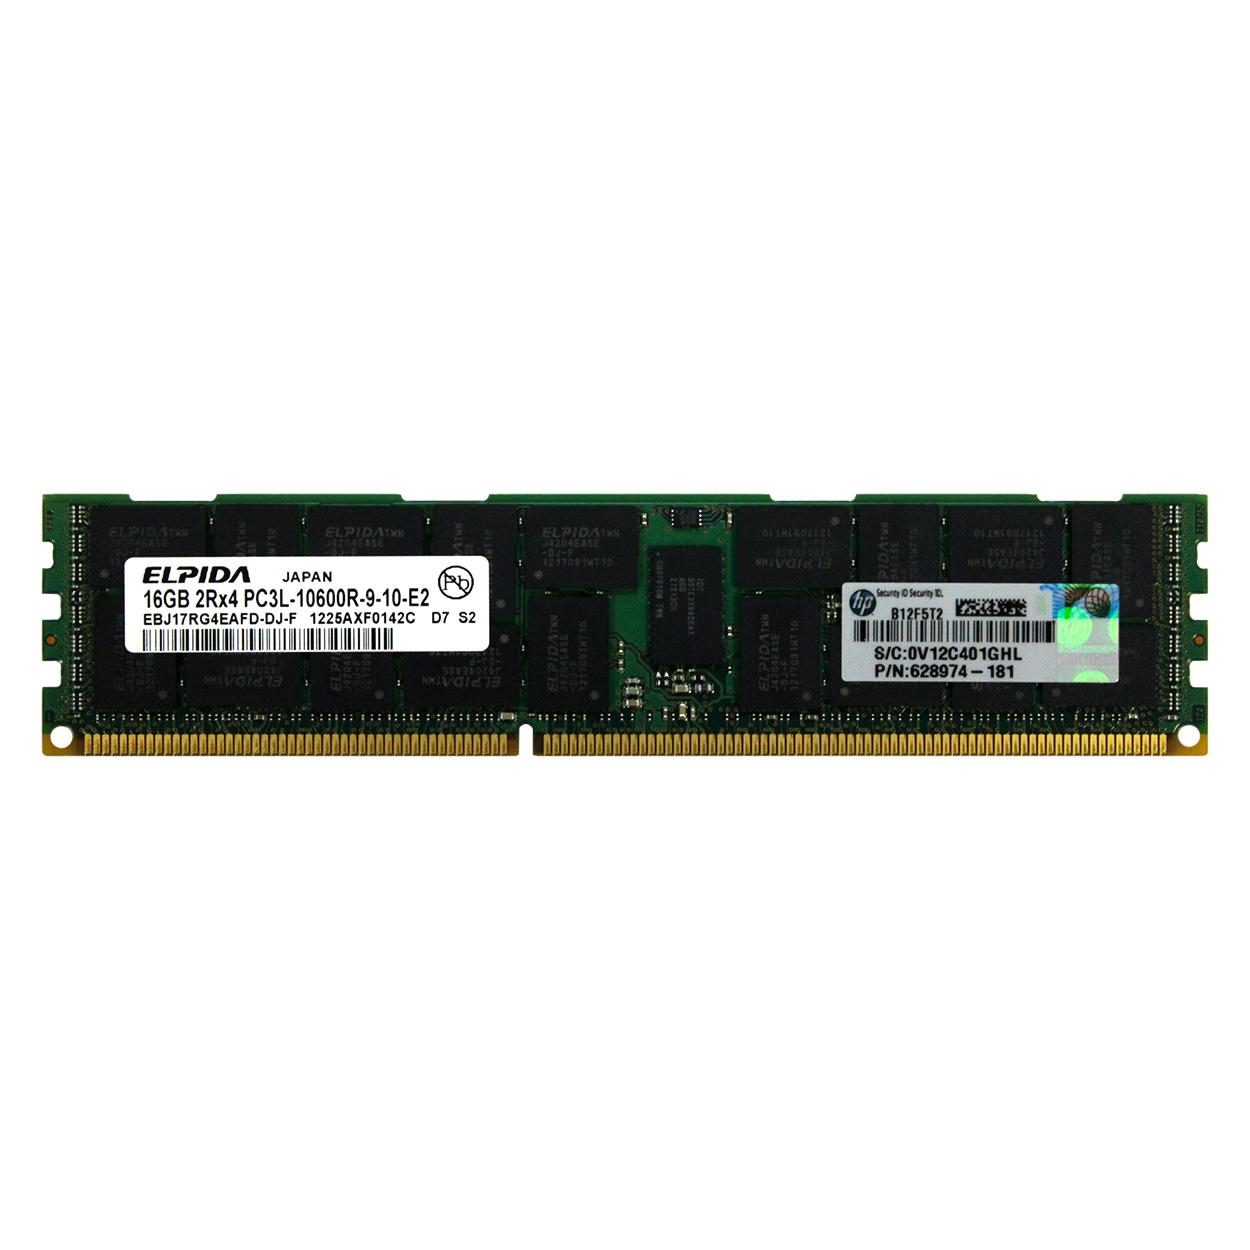 HP 16GB PC3-10600 DDR3-1333 4Rx4 ECC Registered 1.35V DIMM HP PN# 632202-001